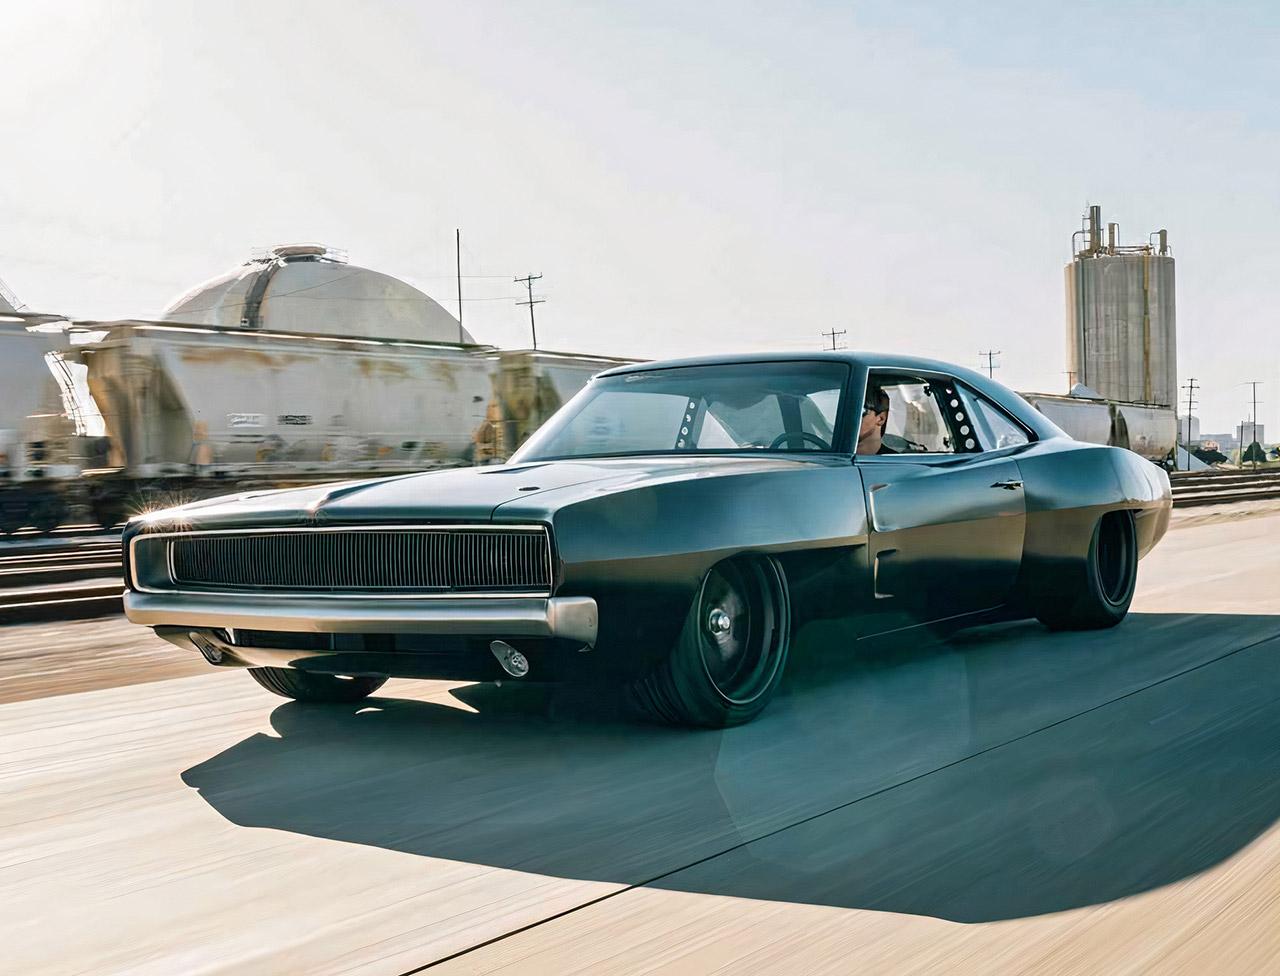 SpeedKore 1968 Dodge Charger Hellacious F9 Vin Diesel